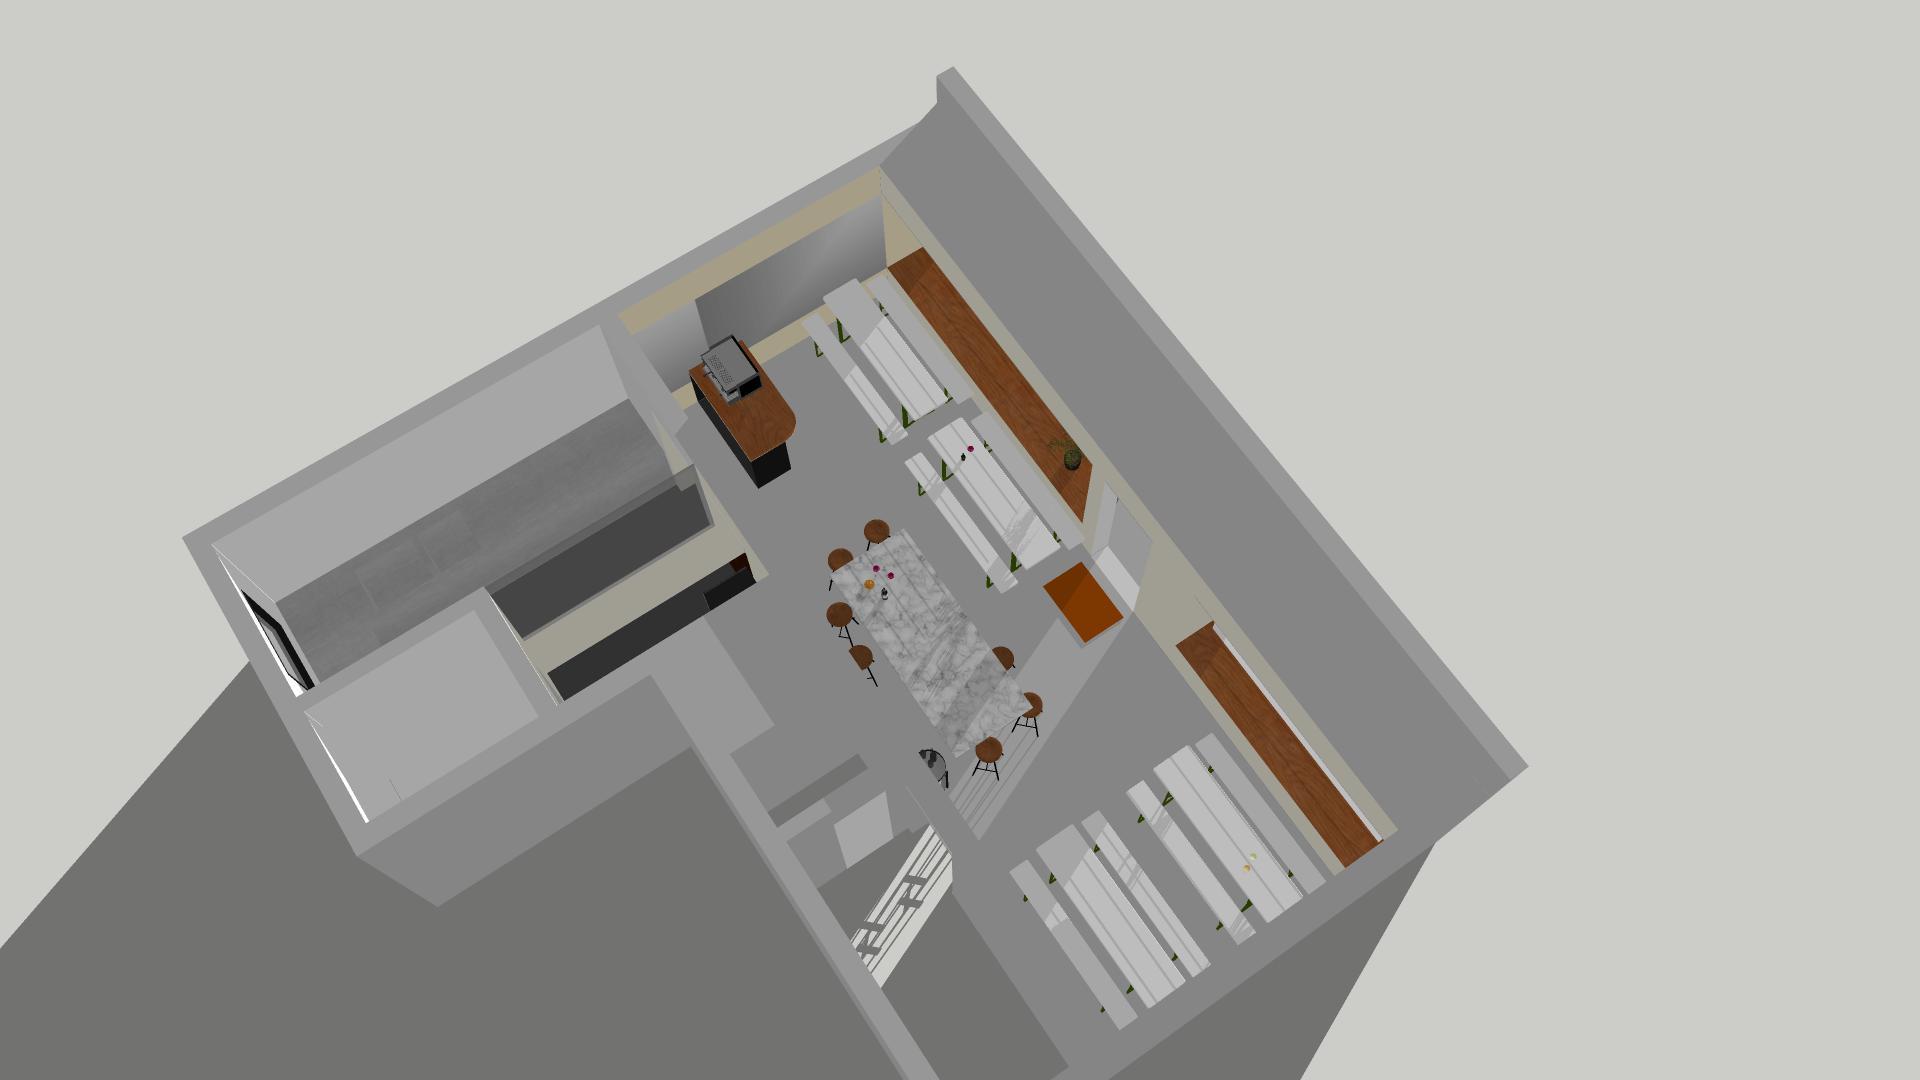 Peryton-Sketchup 6-wine bar0011.jpg